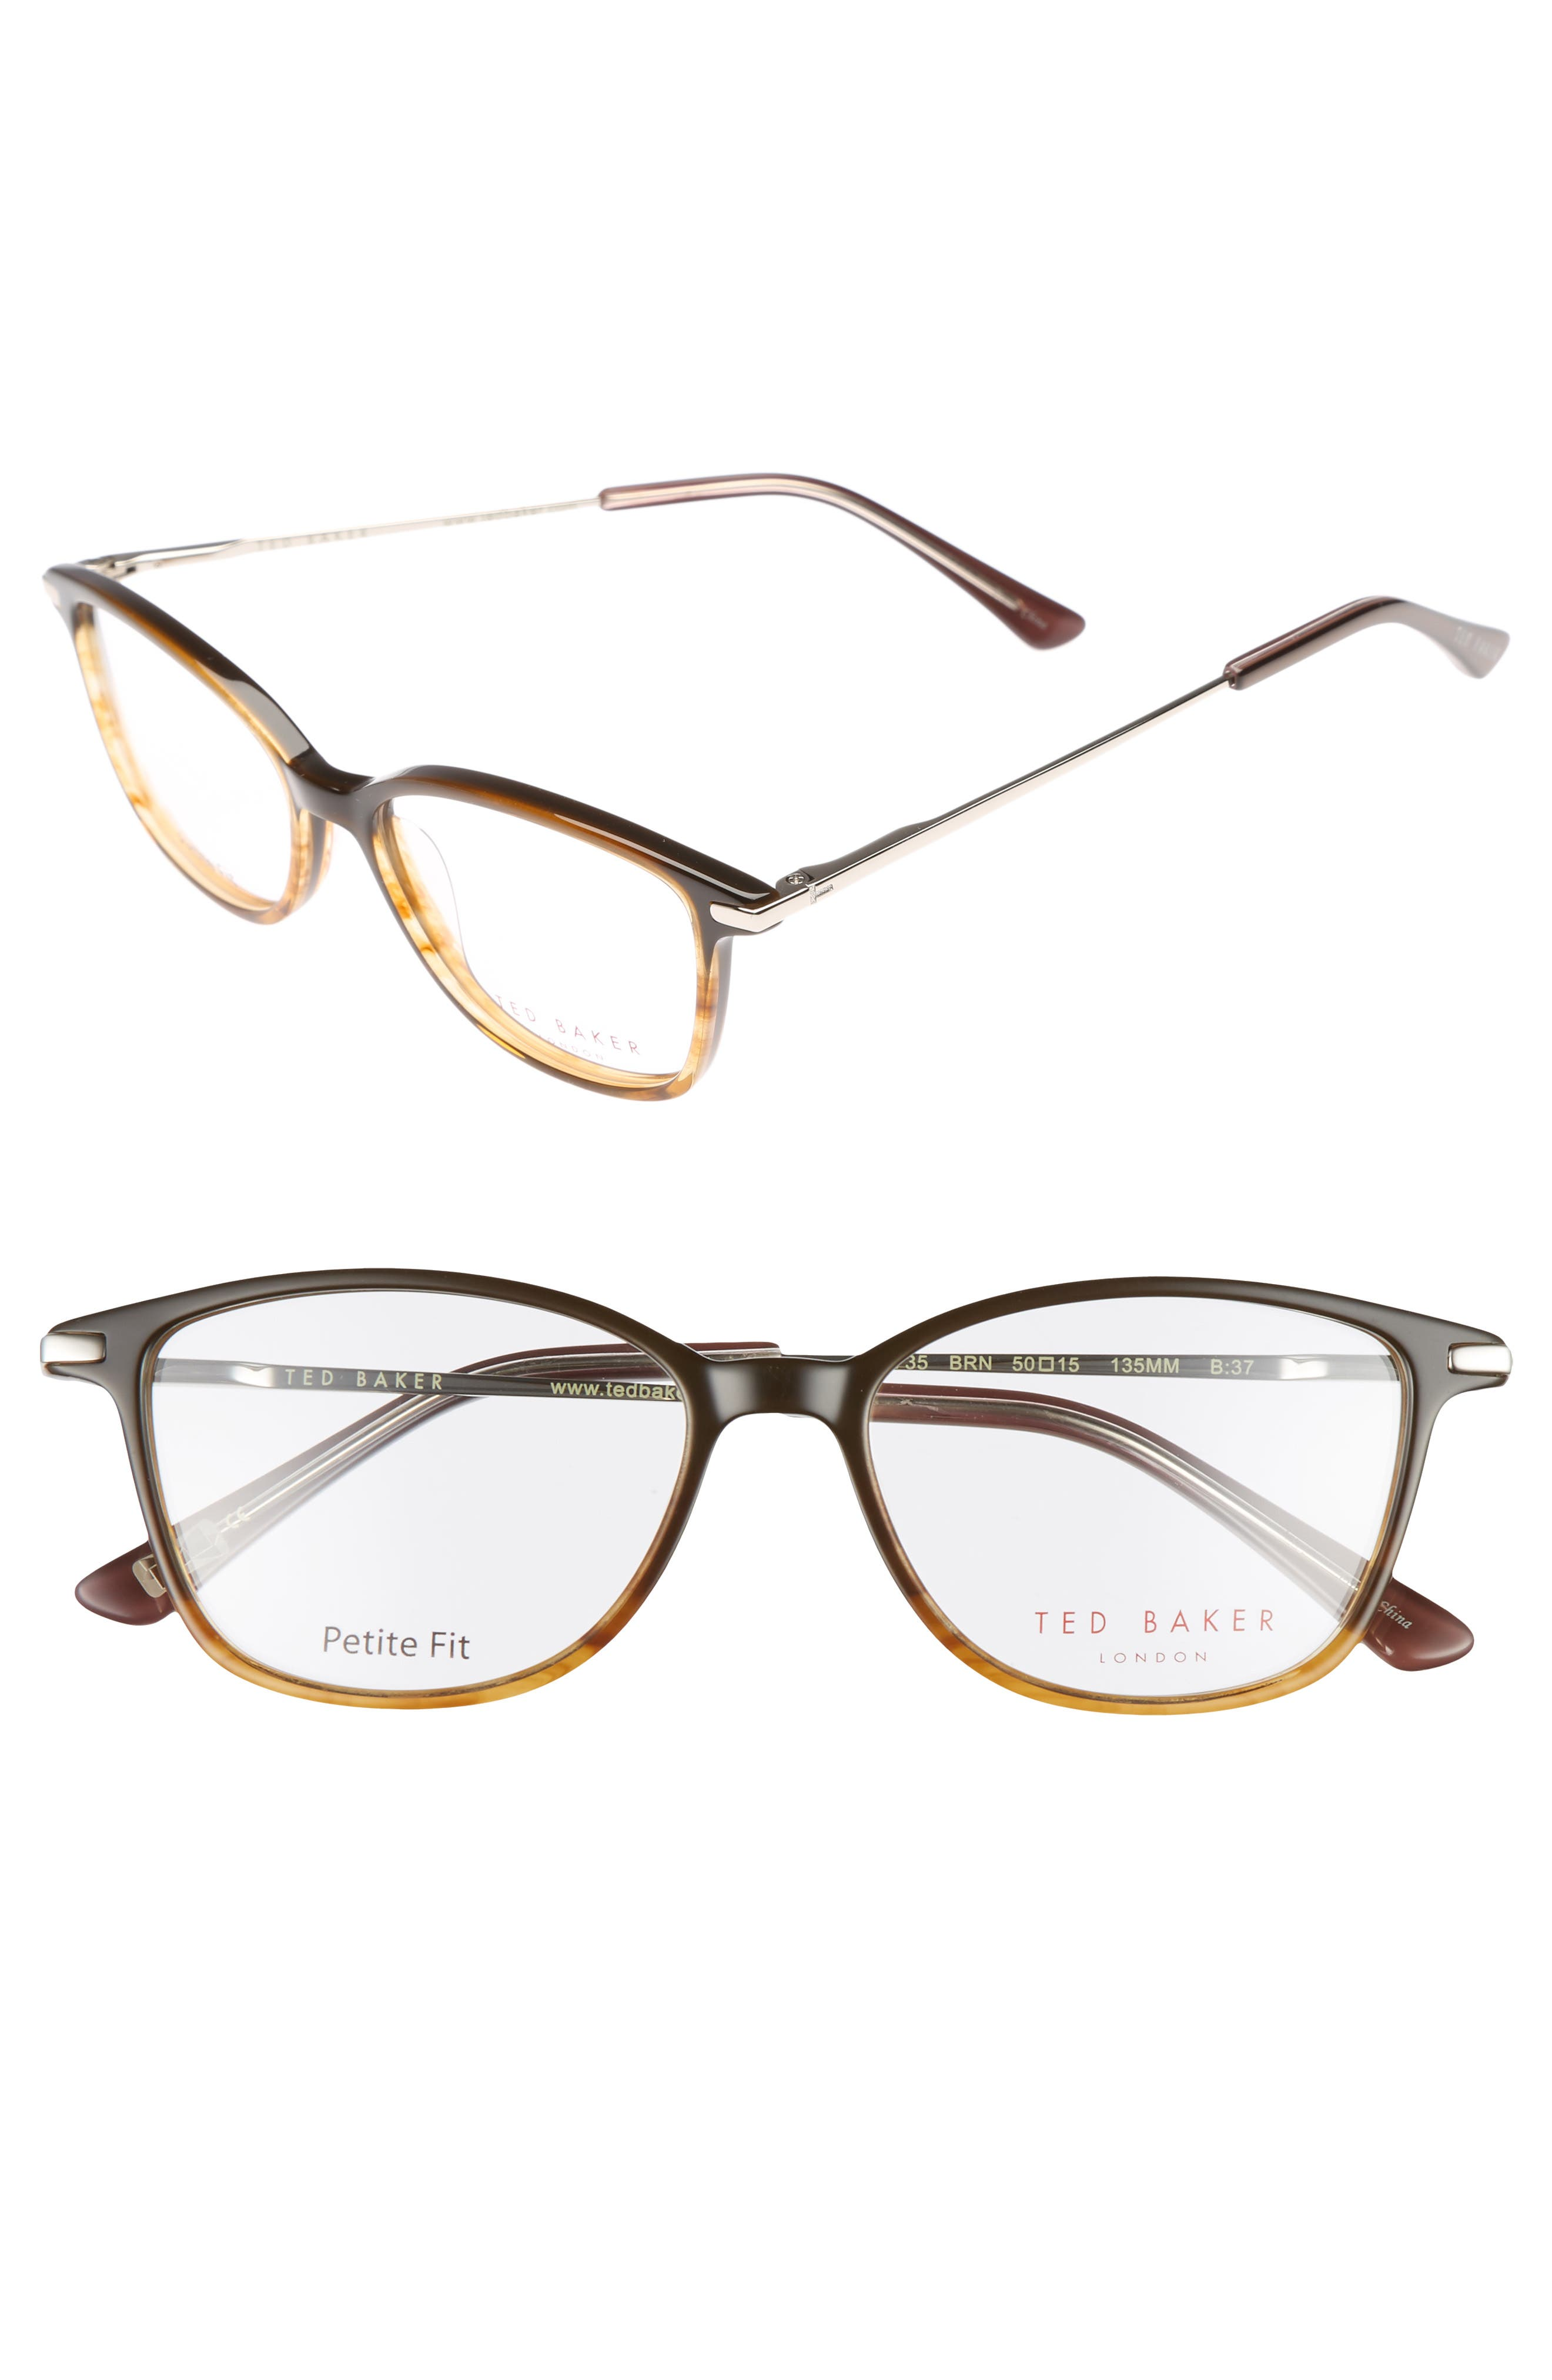 Main Image - Ted Baker London Petite Fit 50mm Optical Glasses